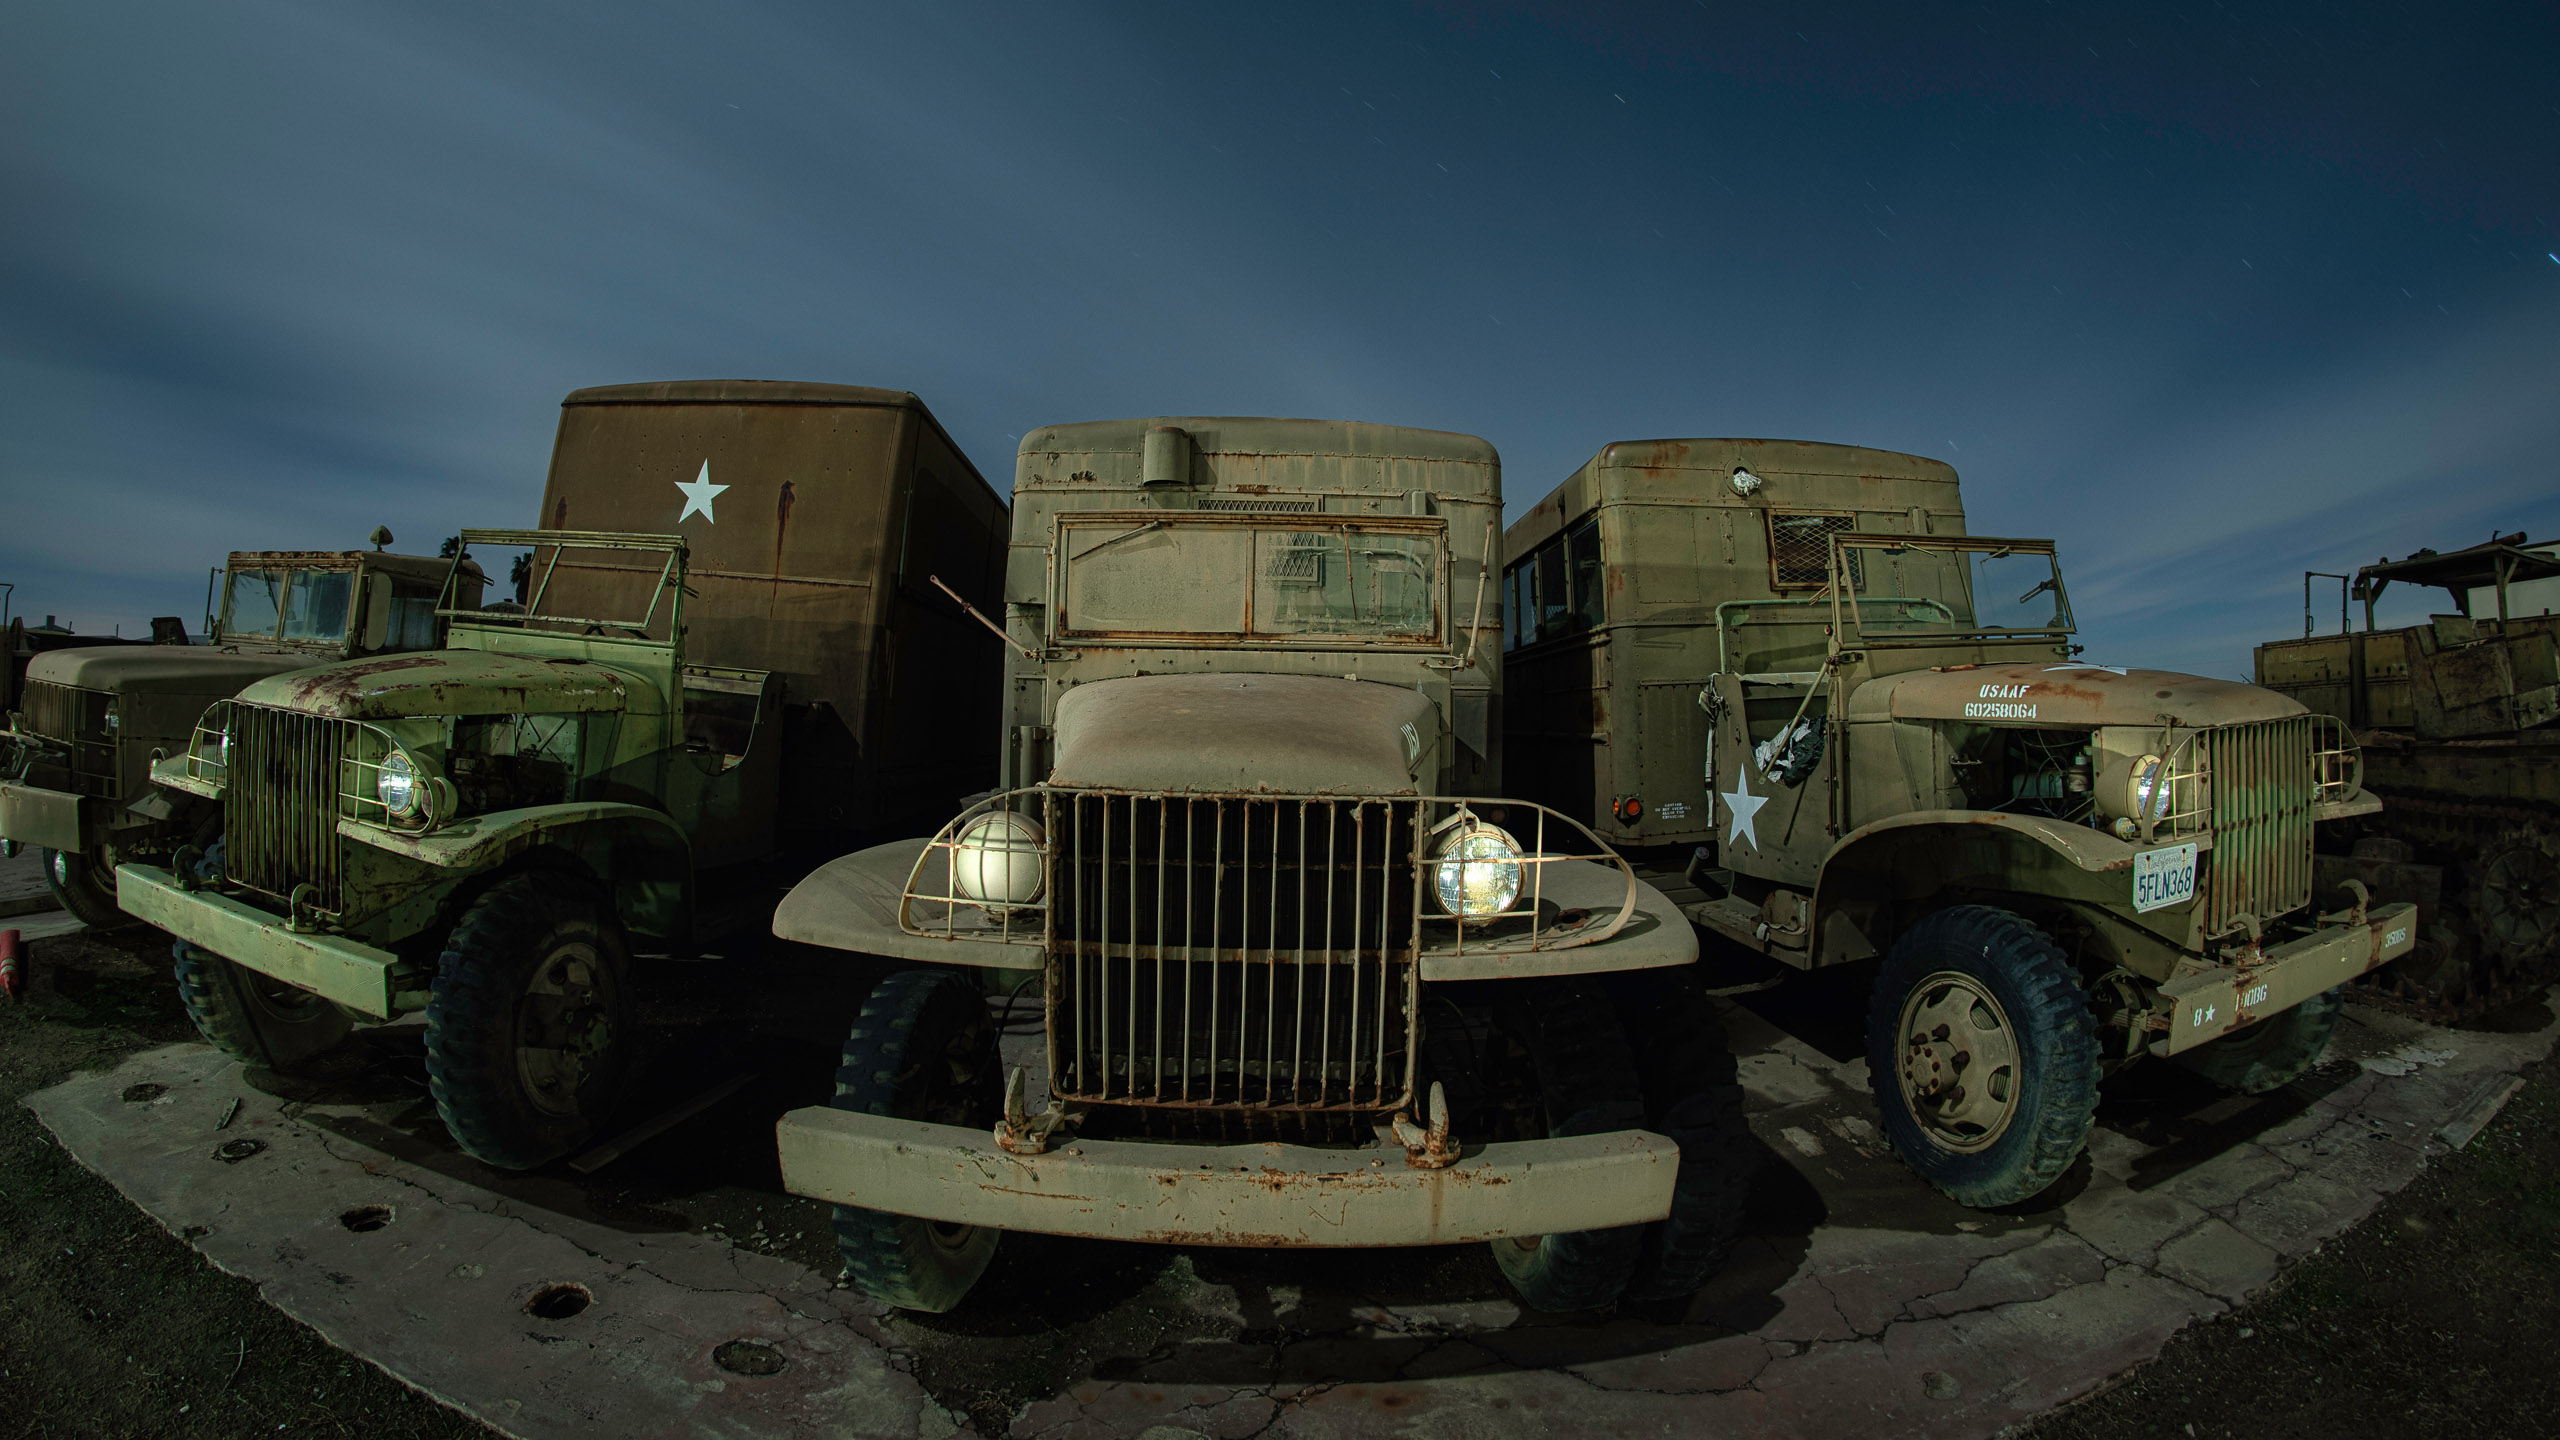 7516_kenlee_eaglefield_201226_1936_3mf8iso200_fisheye_three-military-trucks HEADER PHOTOFOCUS